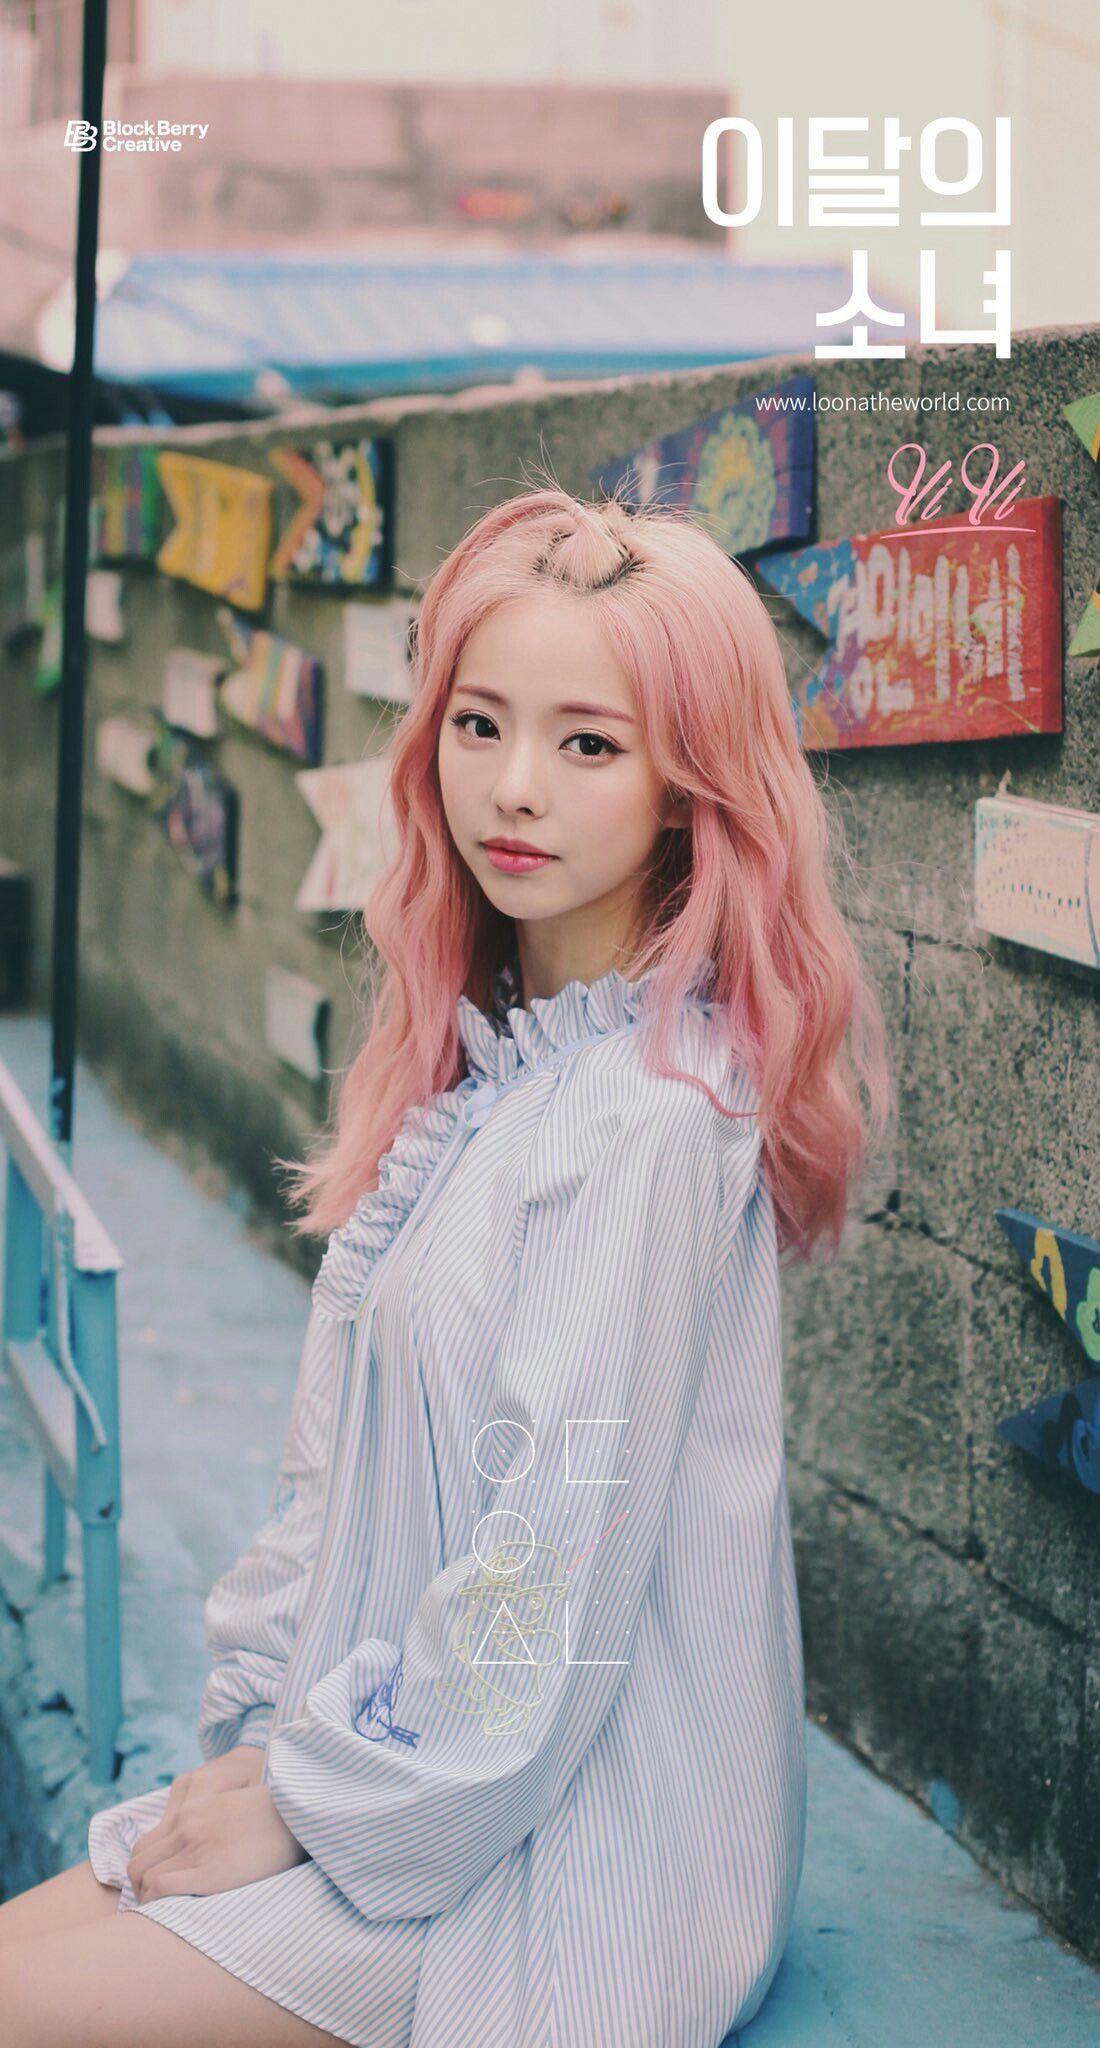 LOONA - ViVi 비비 • Wong Viian 黃珈熙 'Girl Of The Month' №5 #이달의소녀 #LOOΠΔ #핑크머리 | Photography women. Girl. Kpop girls